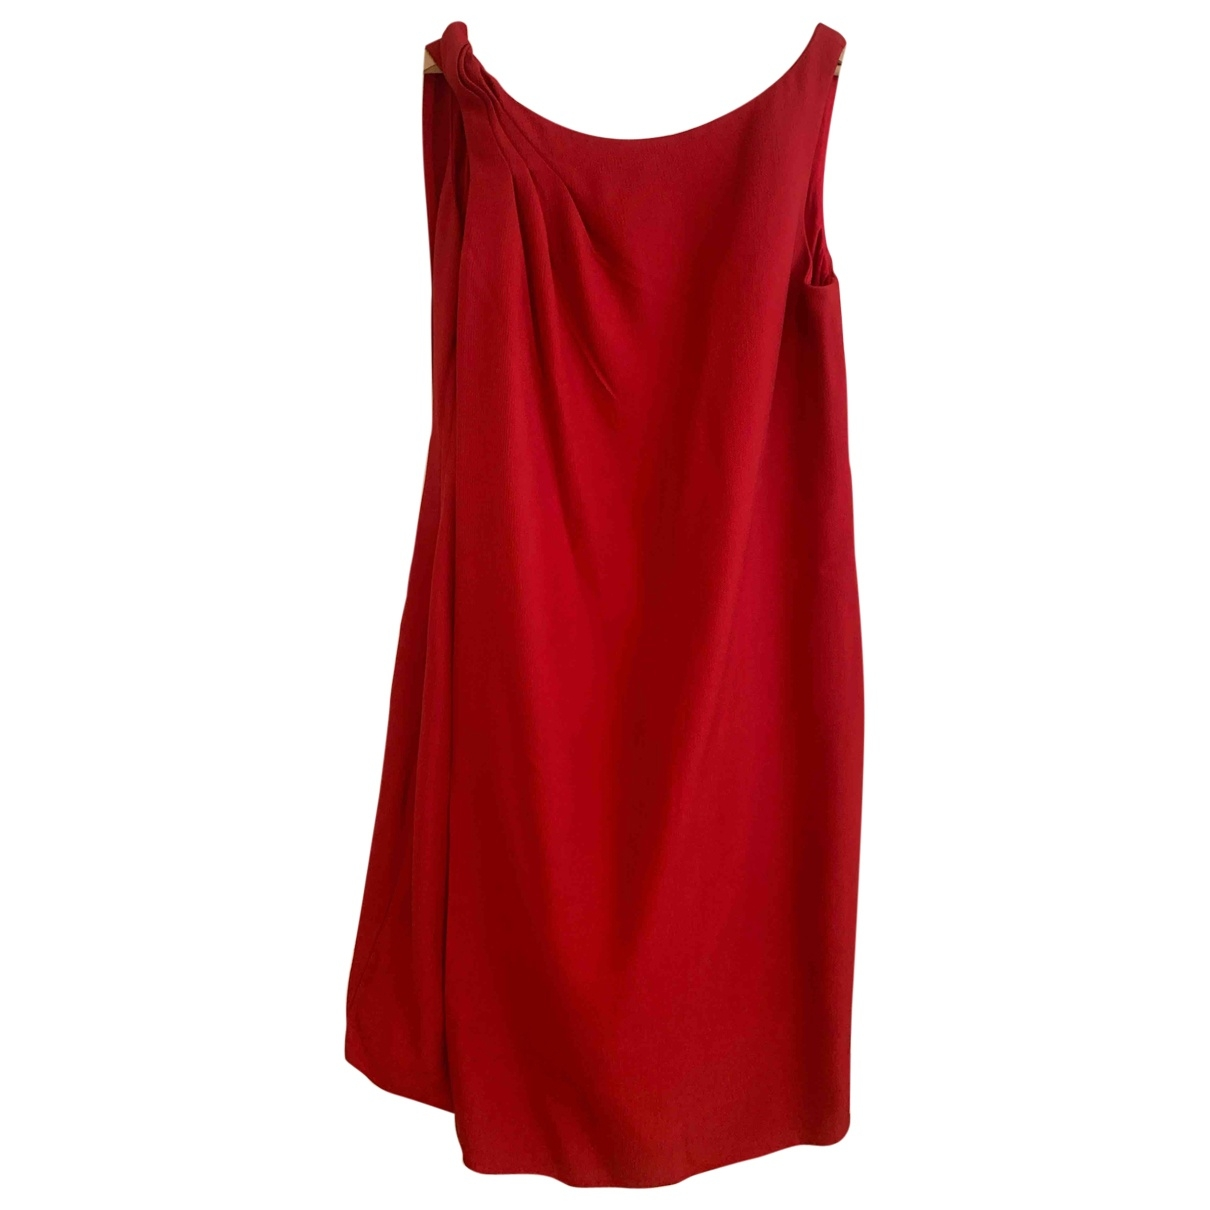 Valentino Garavani \N Red dress for Women 14 UK